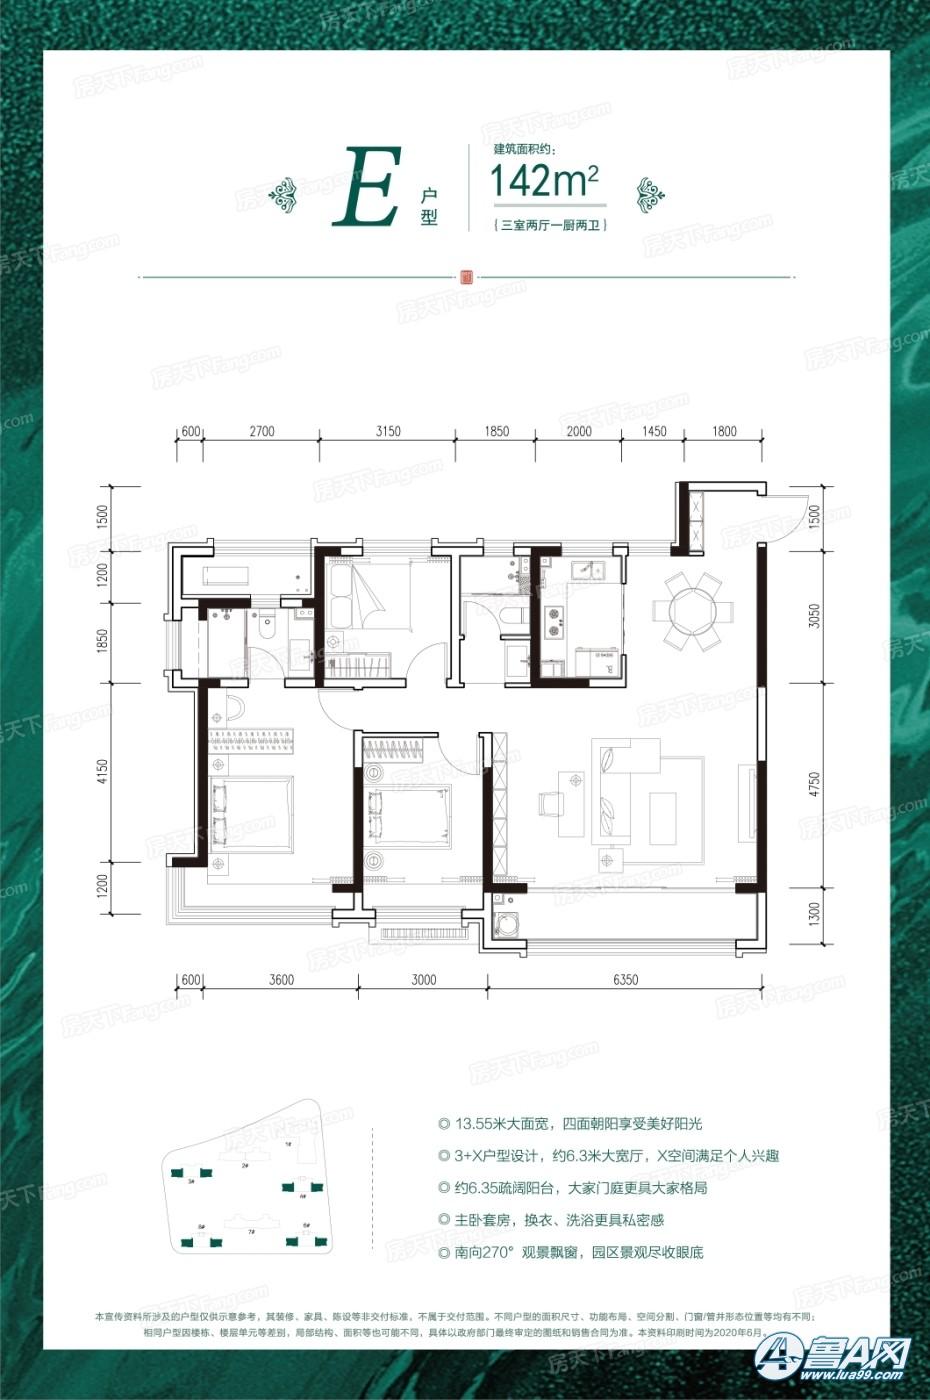 c3e99be1-4b67-4cf9-aeeb-46adc6558d64.jpg